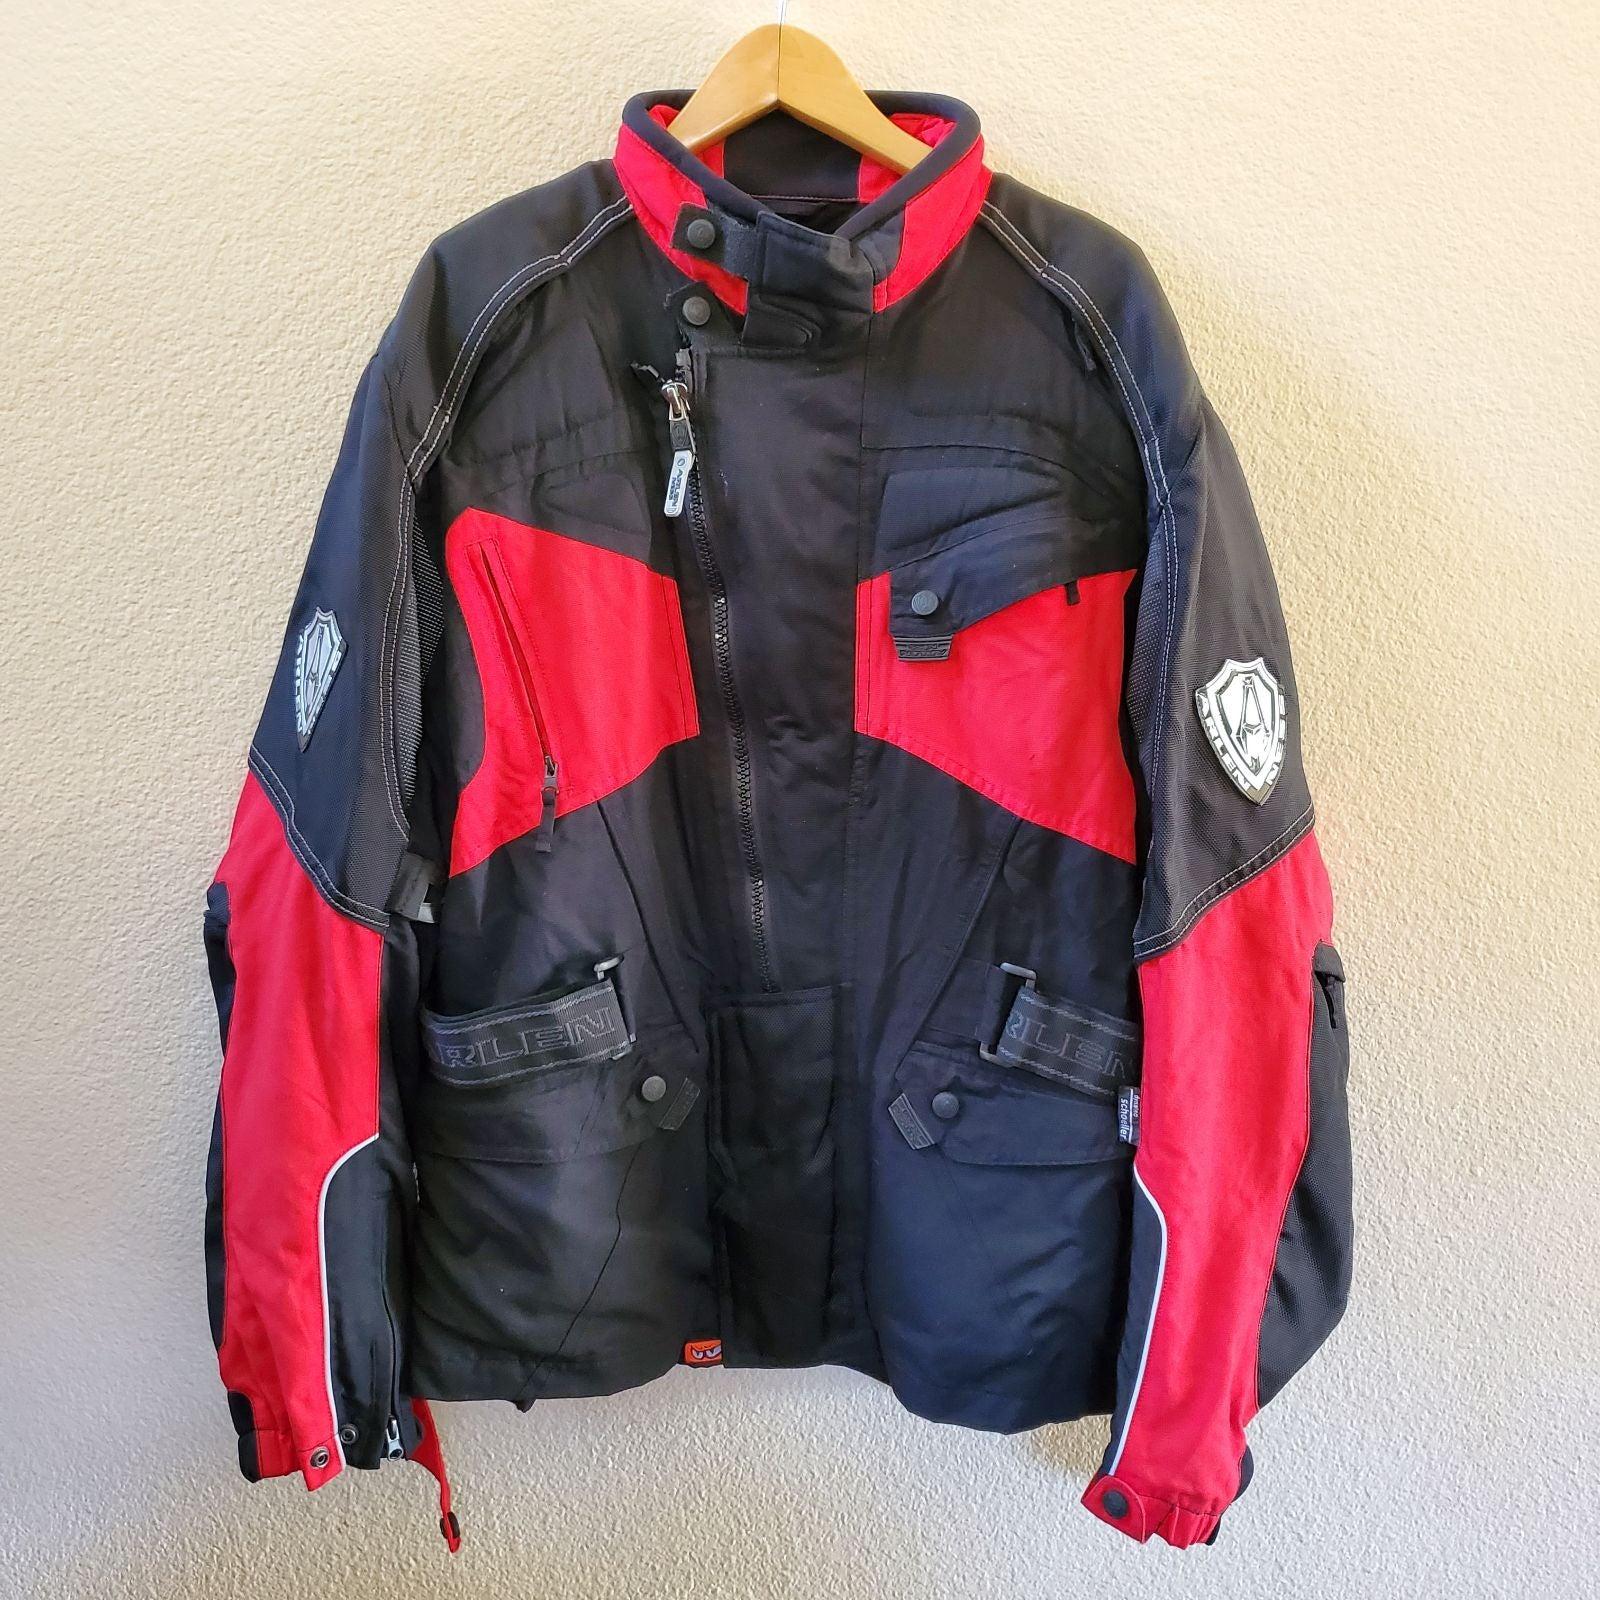 Arlen Ness Nylon Armored Riding Jacket